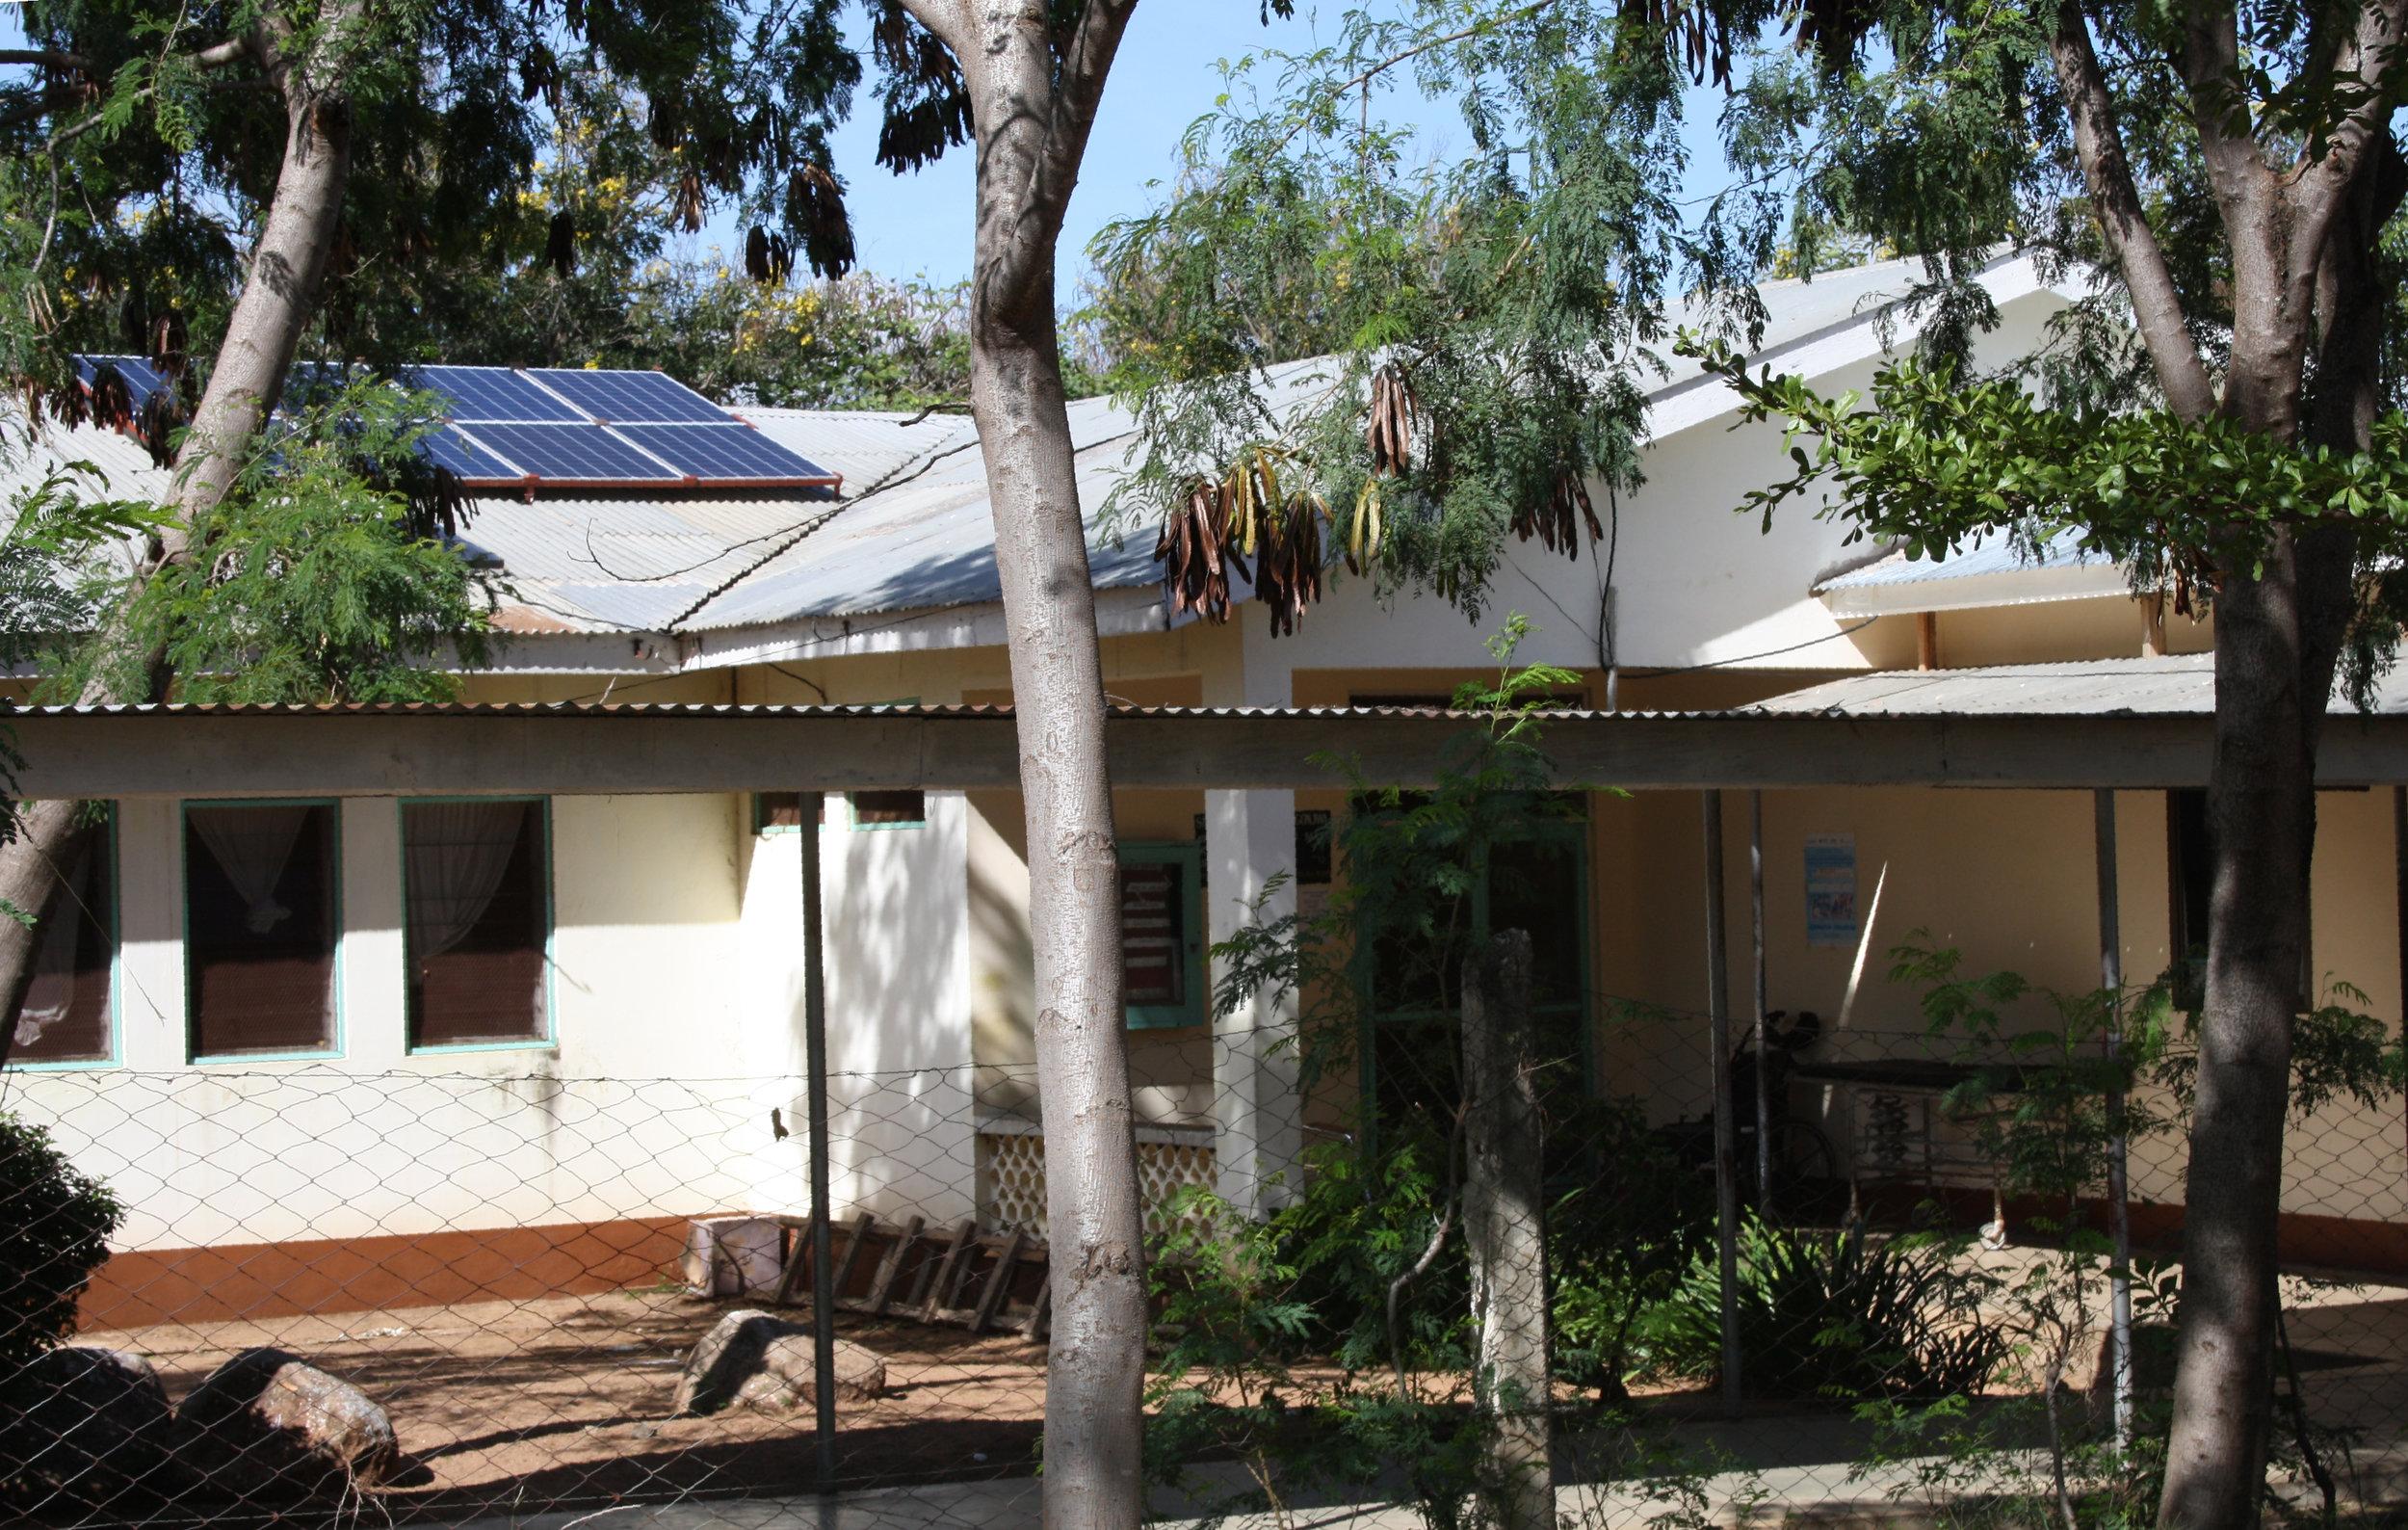 Solar cells on the maternity ward